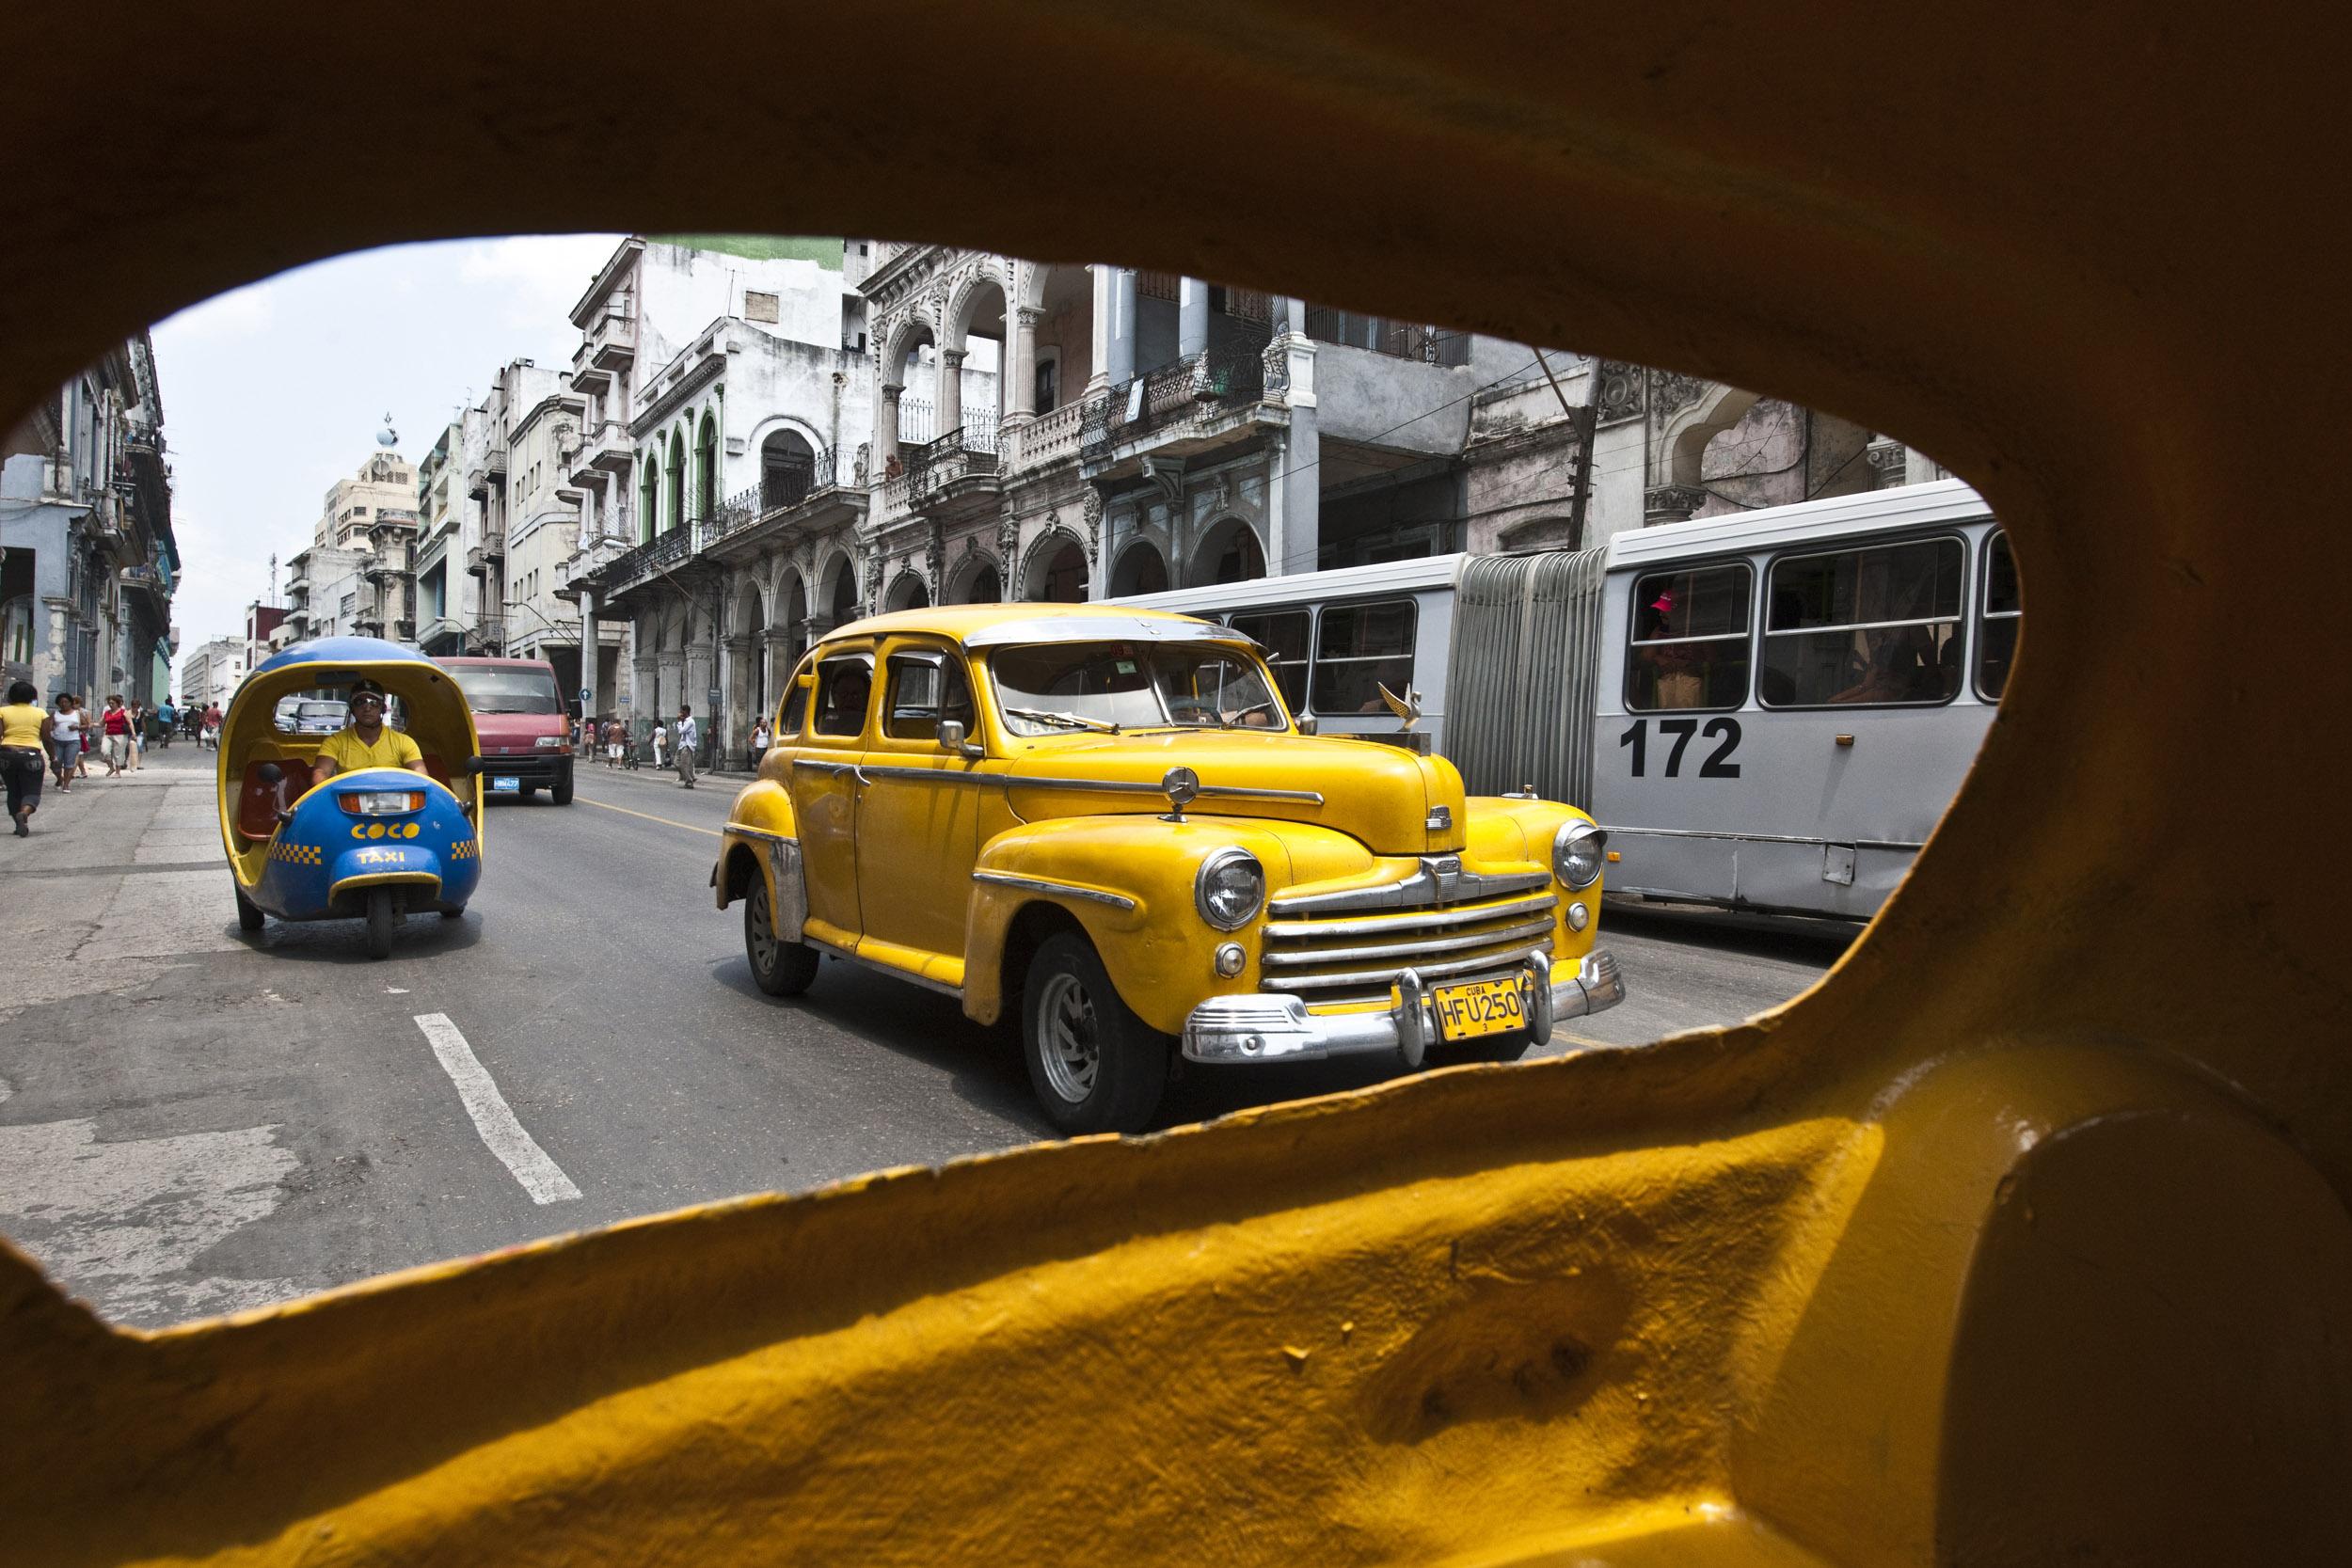 Amarillo - Cuba - Hector Garrido, Aerial and human photography